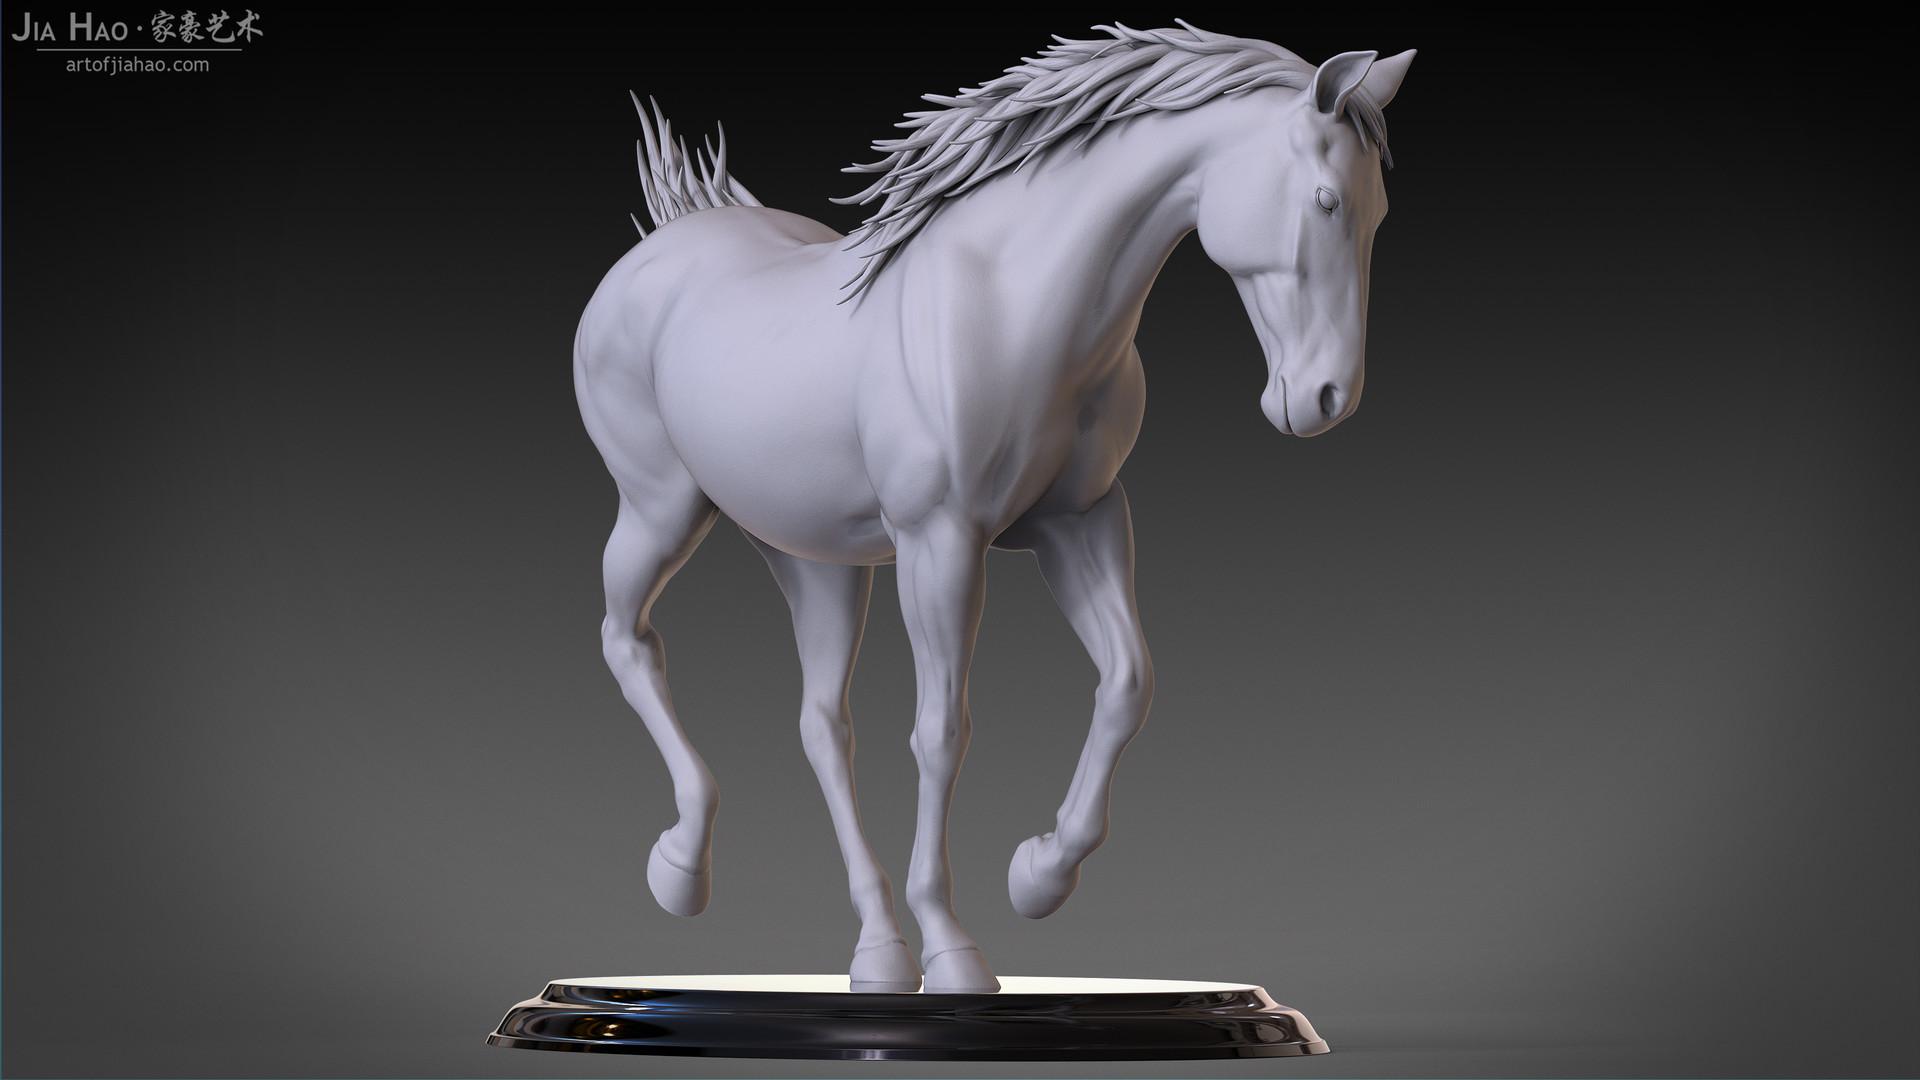 Jia hao horse sculpture comp clay 07